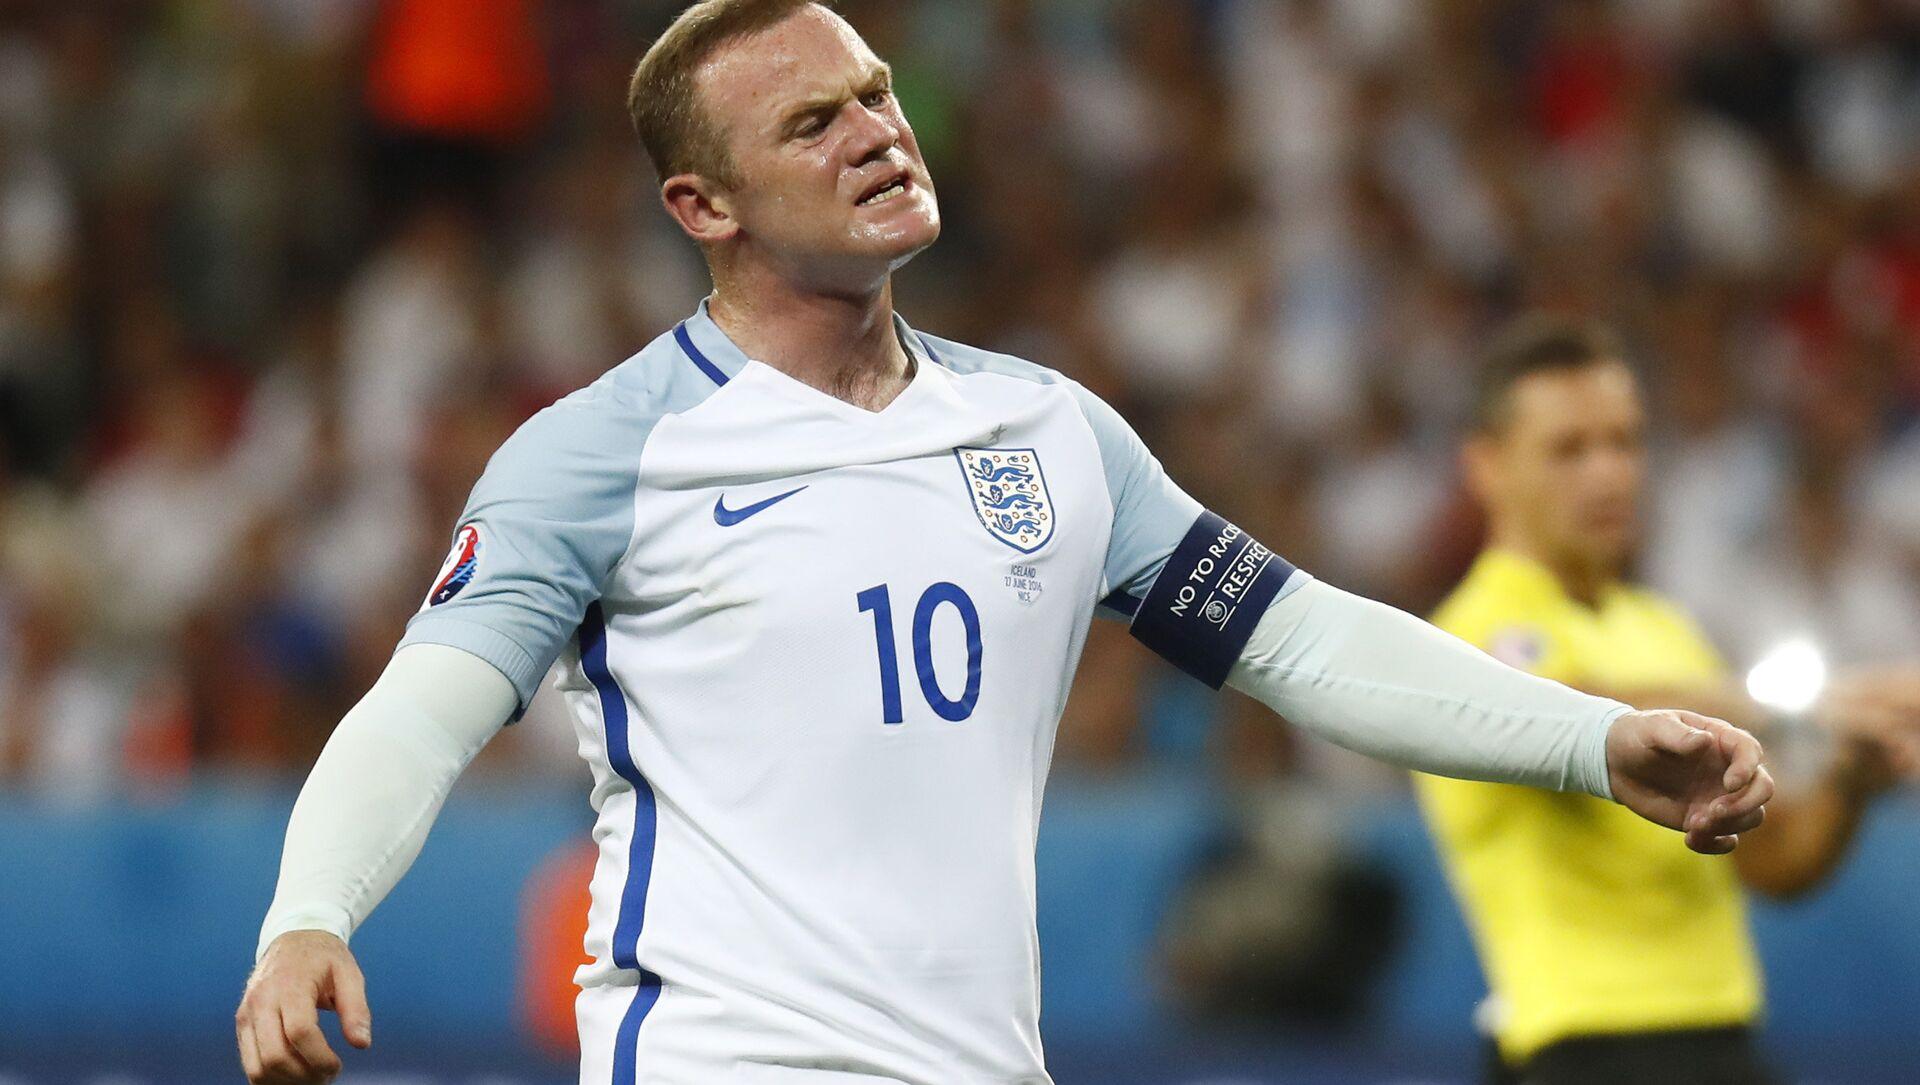 Football Soccer - England v Iceland - EURO 2016 - Round of 16 - Stade de Nice, Nice, France - 27/6/16 England's Wayne Rooney reacts - Sputnik International, 1920, 01.08.2021